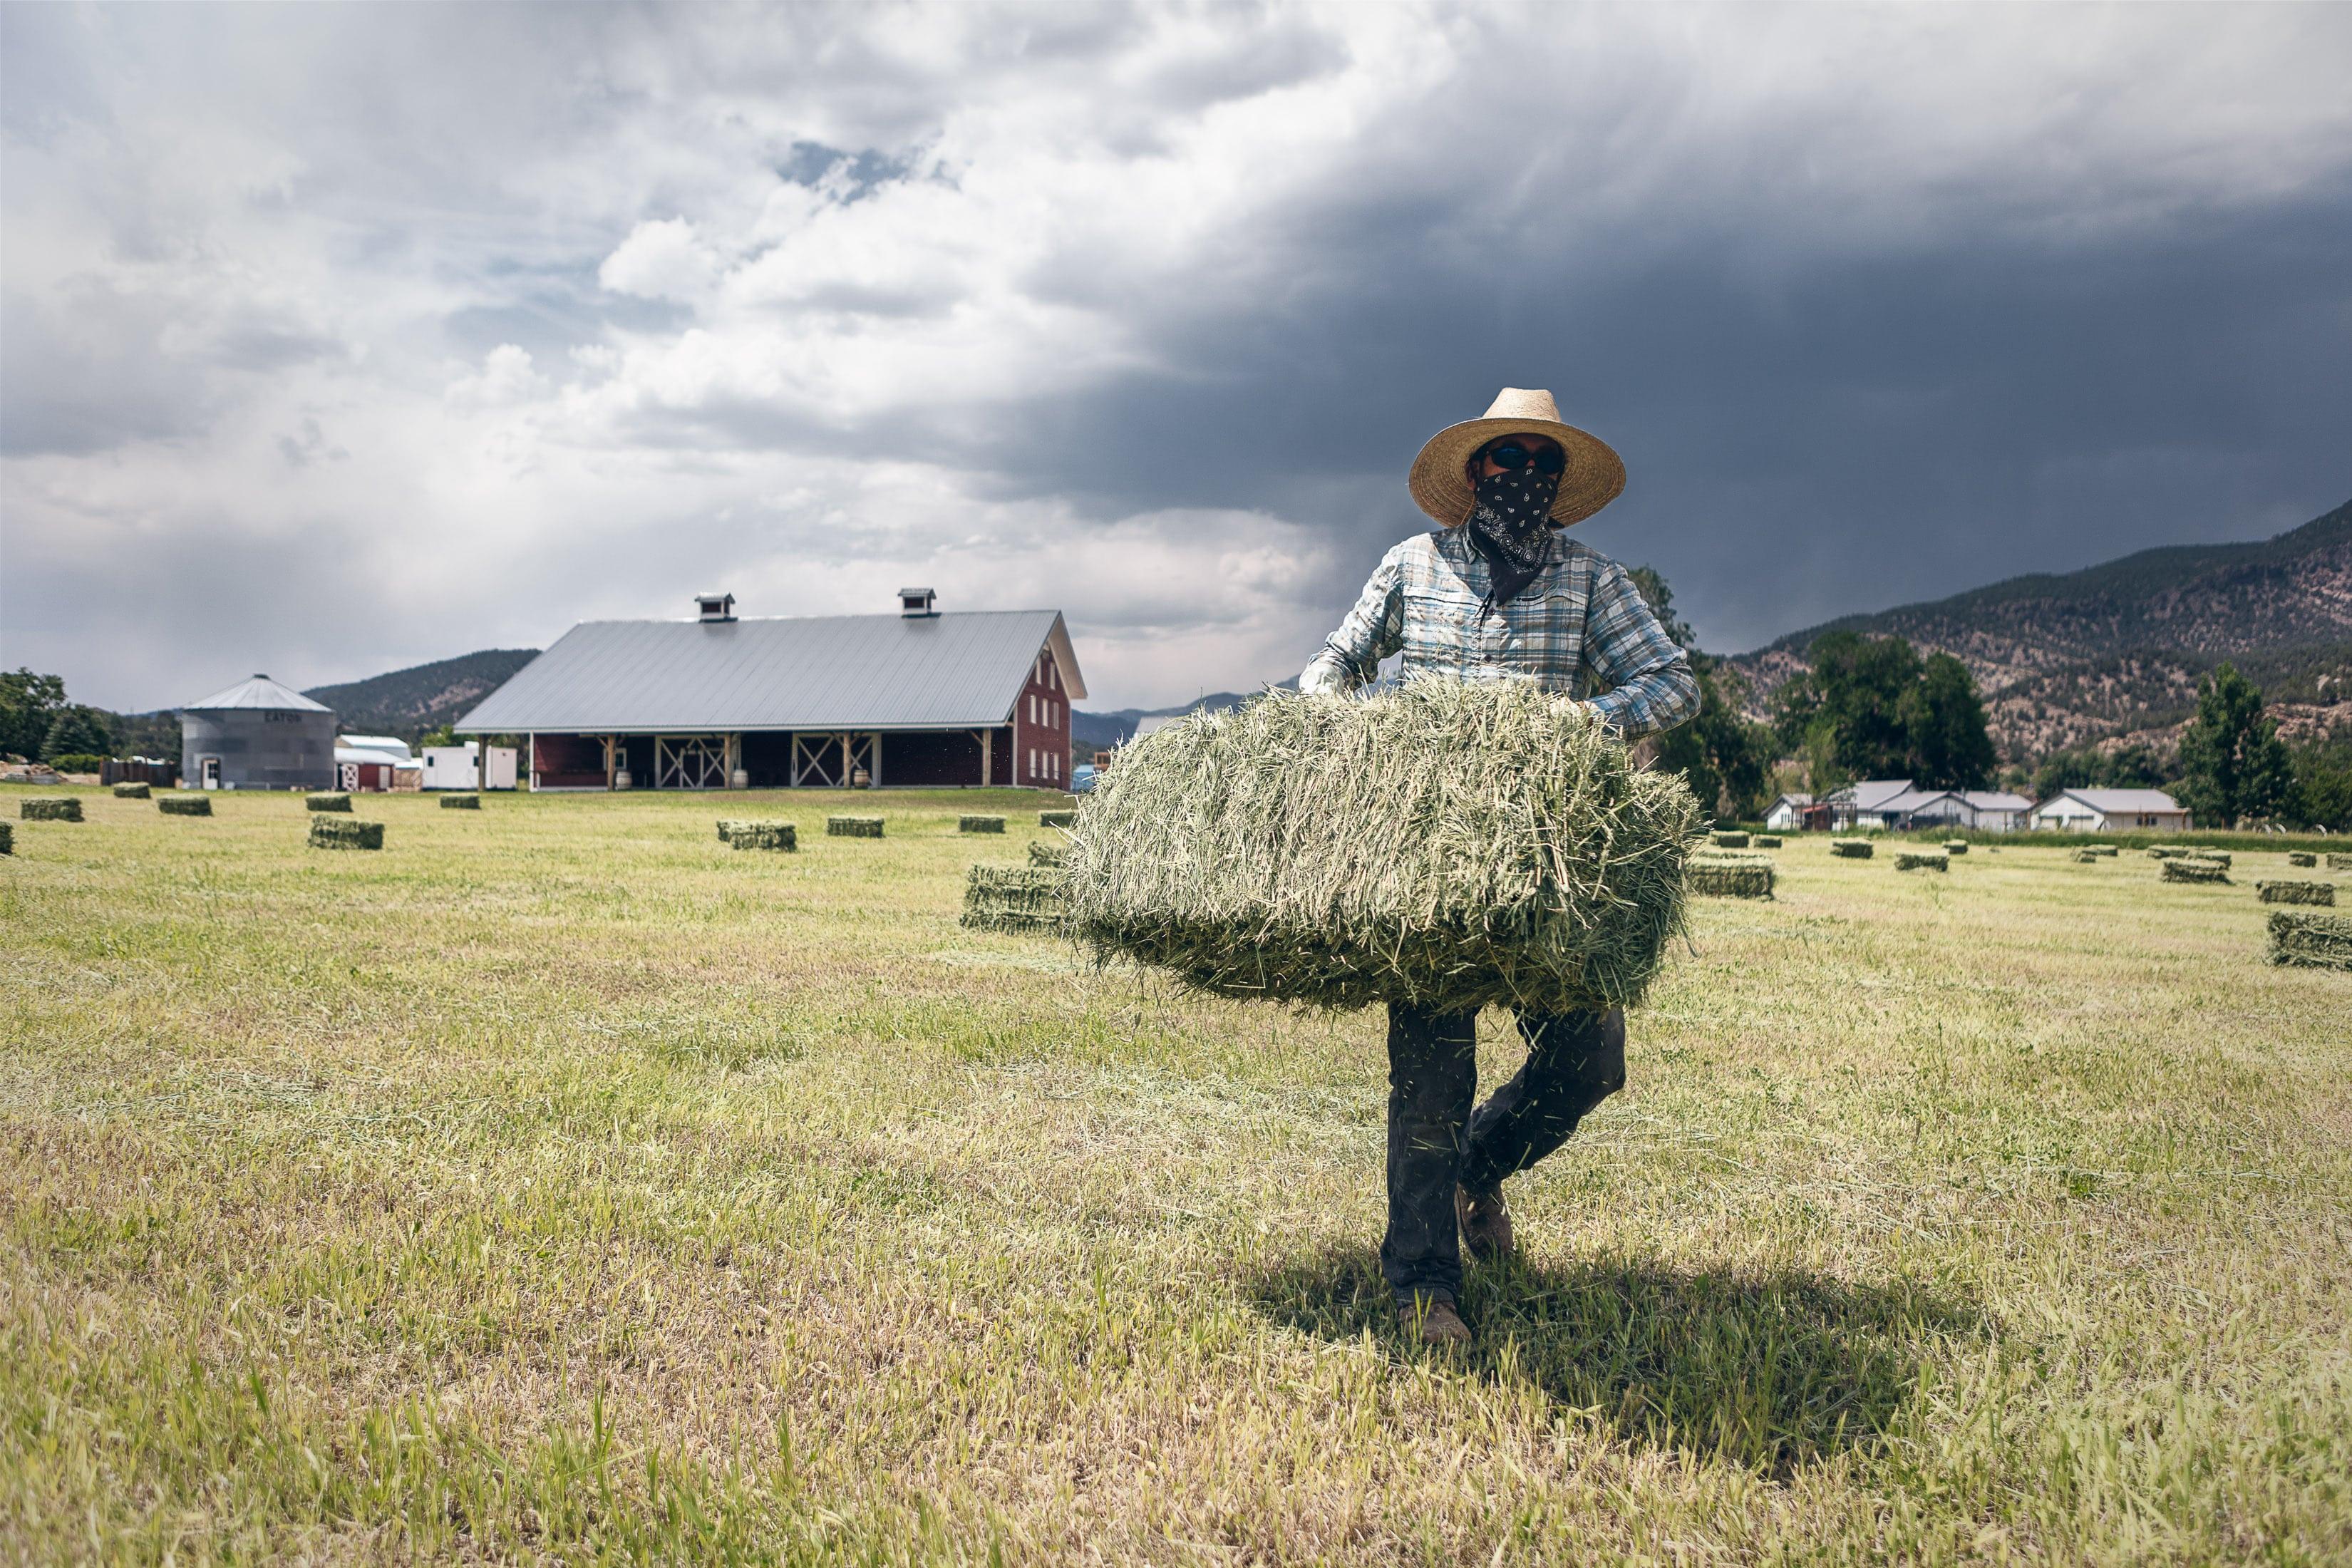 a man lifts a bail of hay on a hay farm in Howard, Colorado